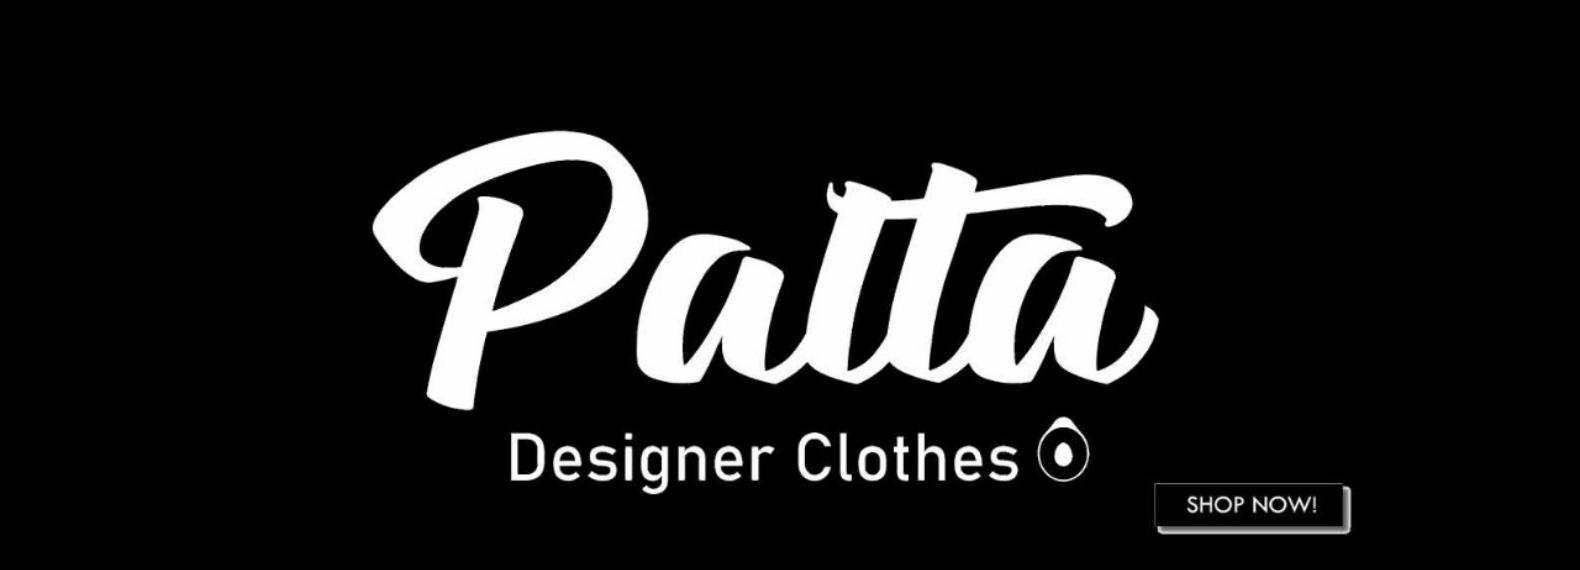 Banner PALTA - Inactivo